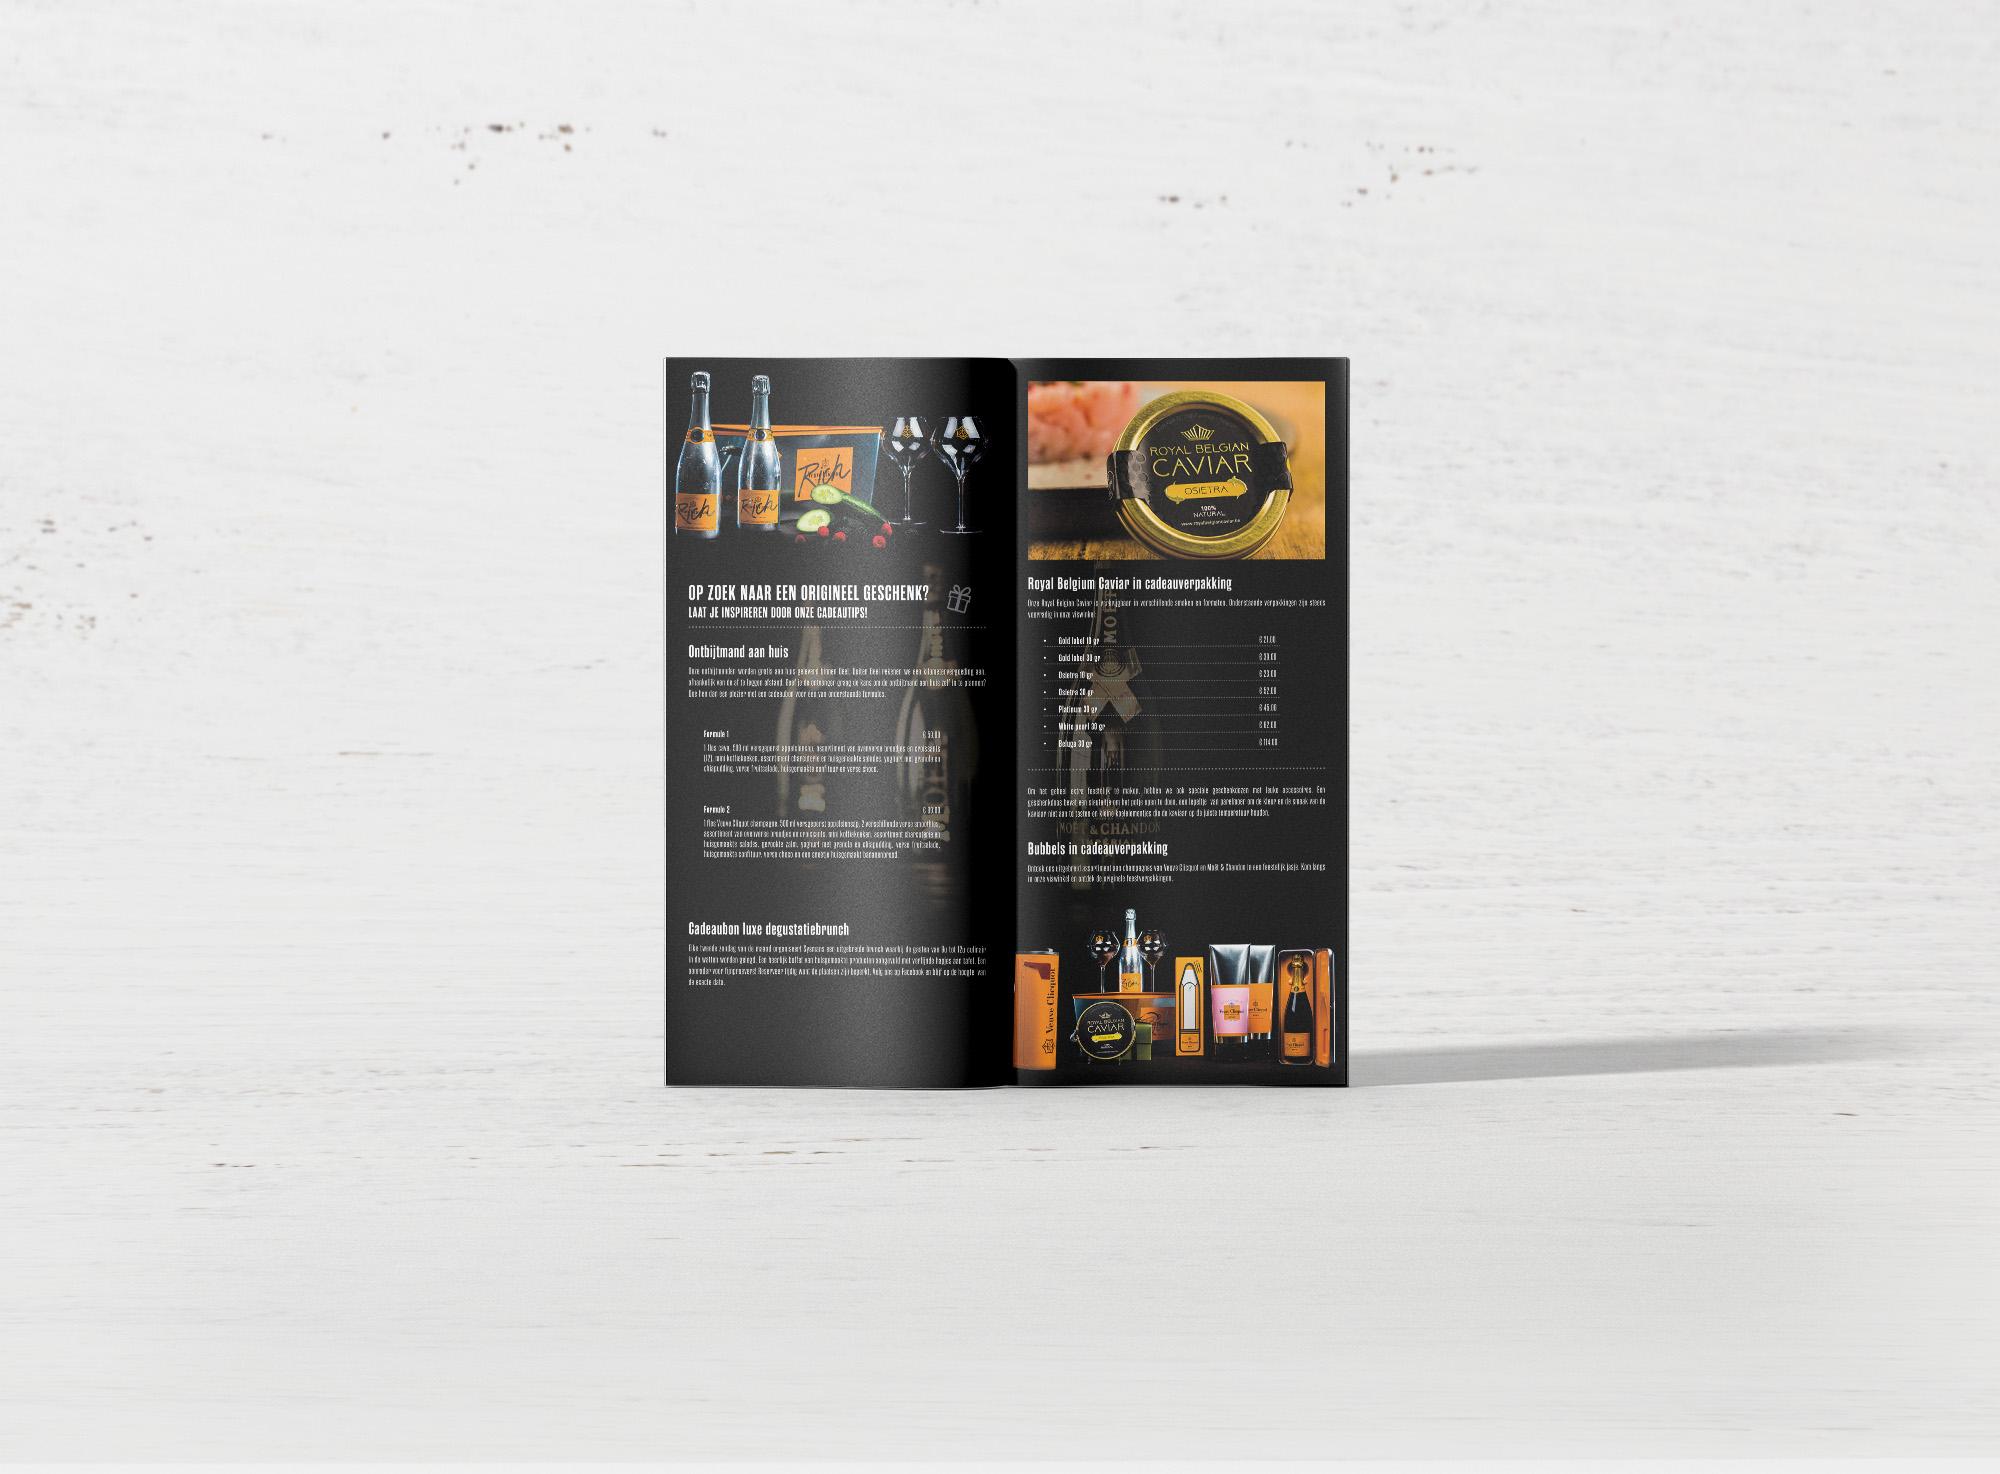 Feestfolder Sysmans Food Stores - Cadeaus en Royal Belgian Caviar